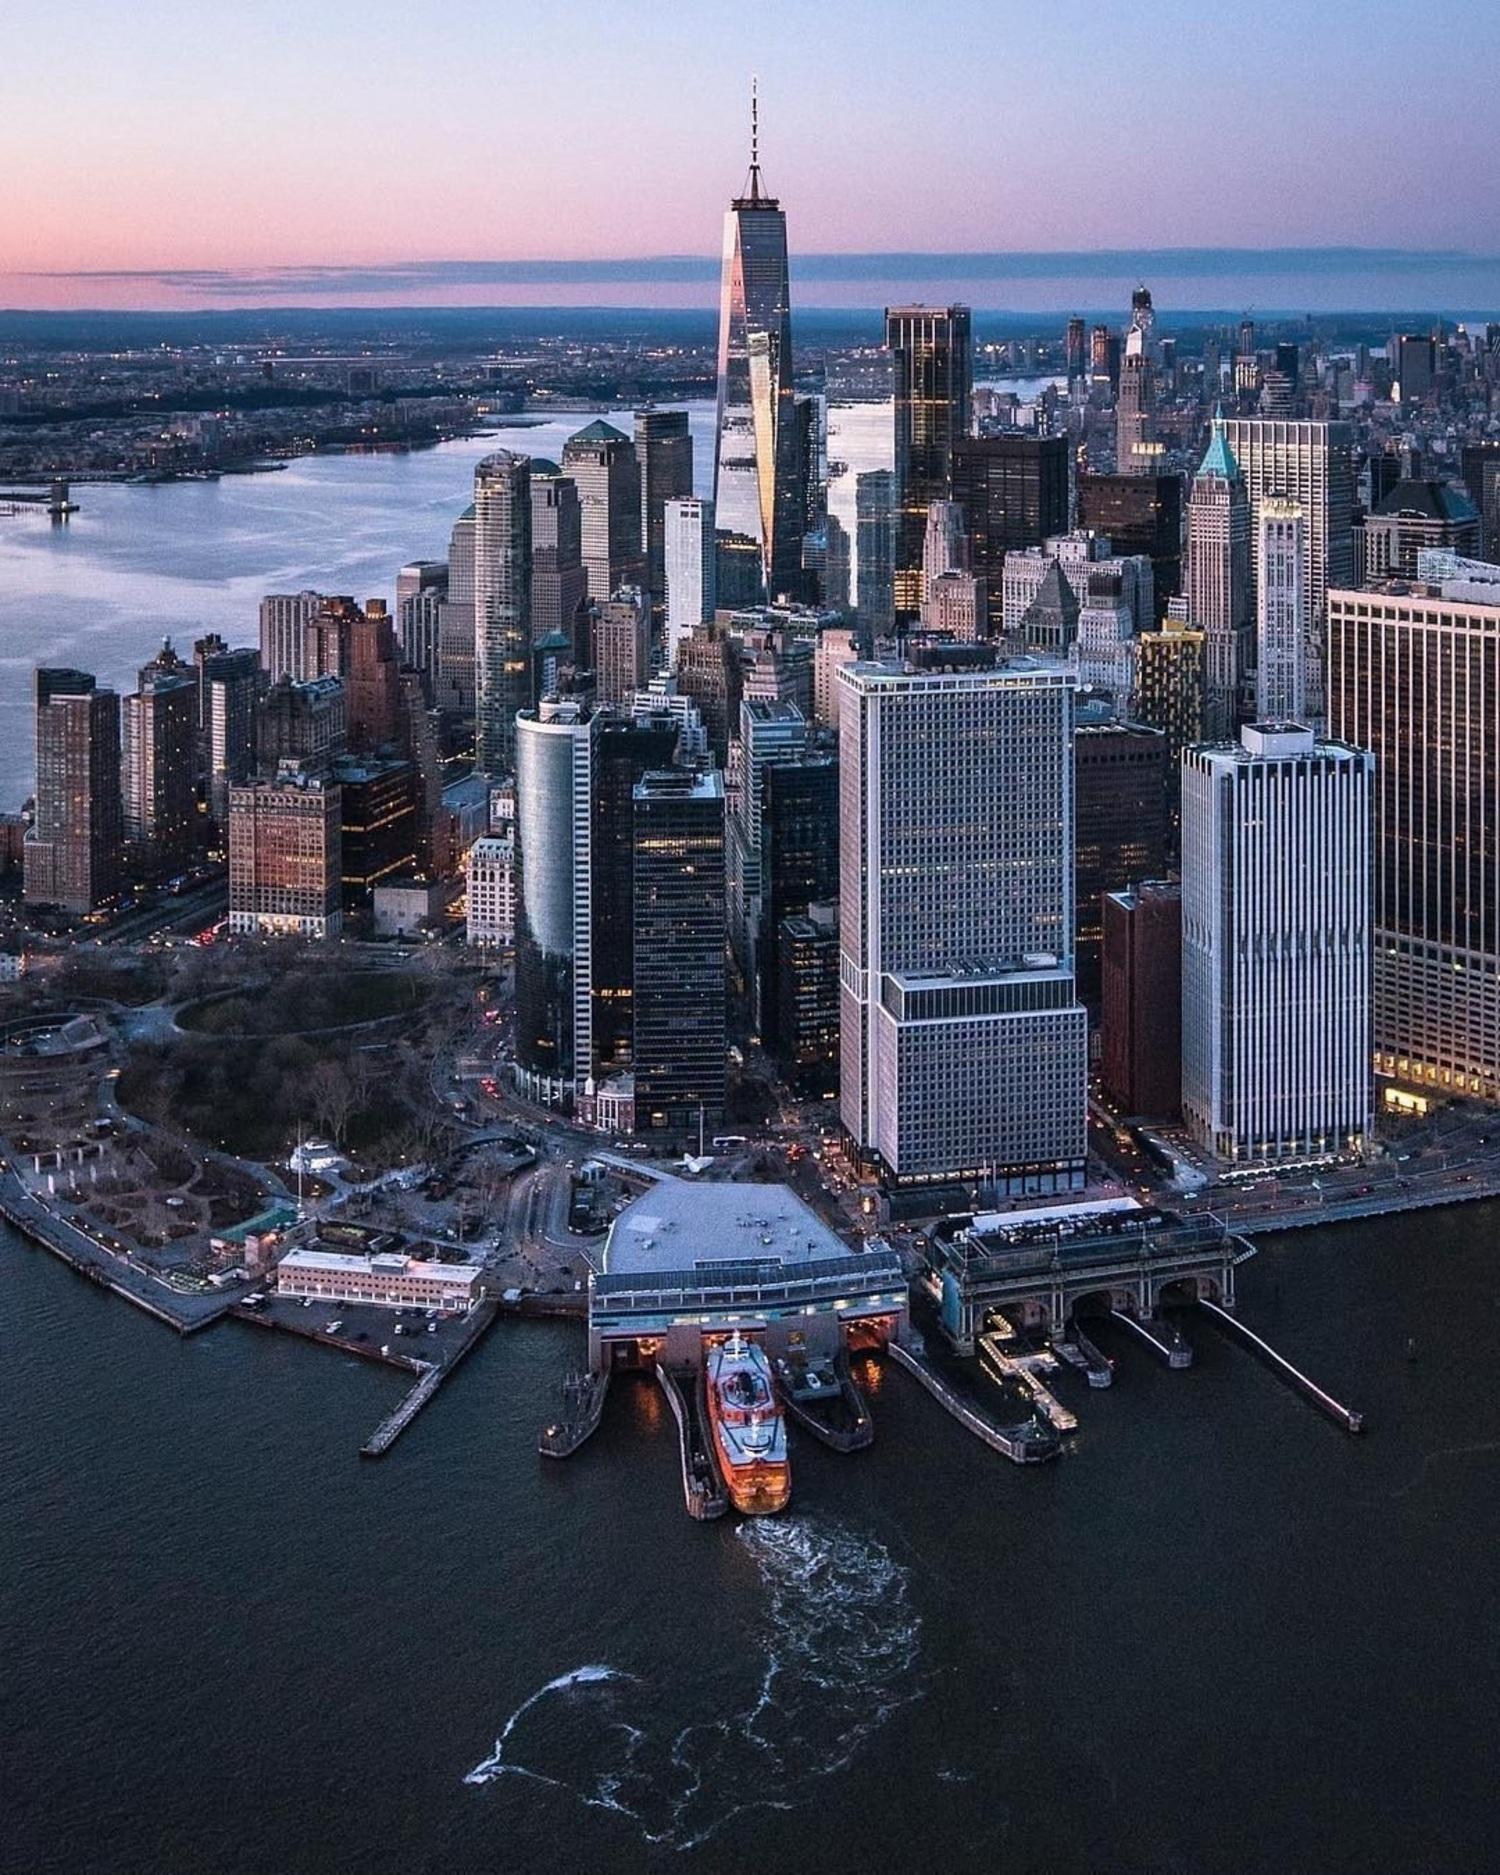 New York, New York. Photo via @flynyon #viewingnyc #nyc #newyork #newyorkcity